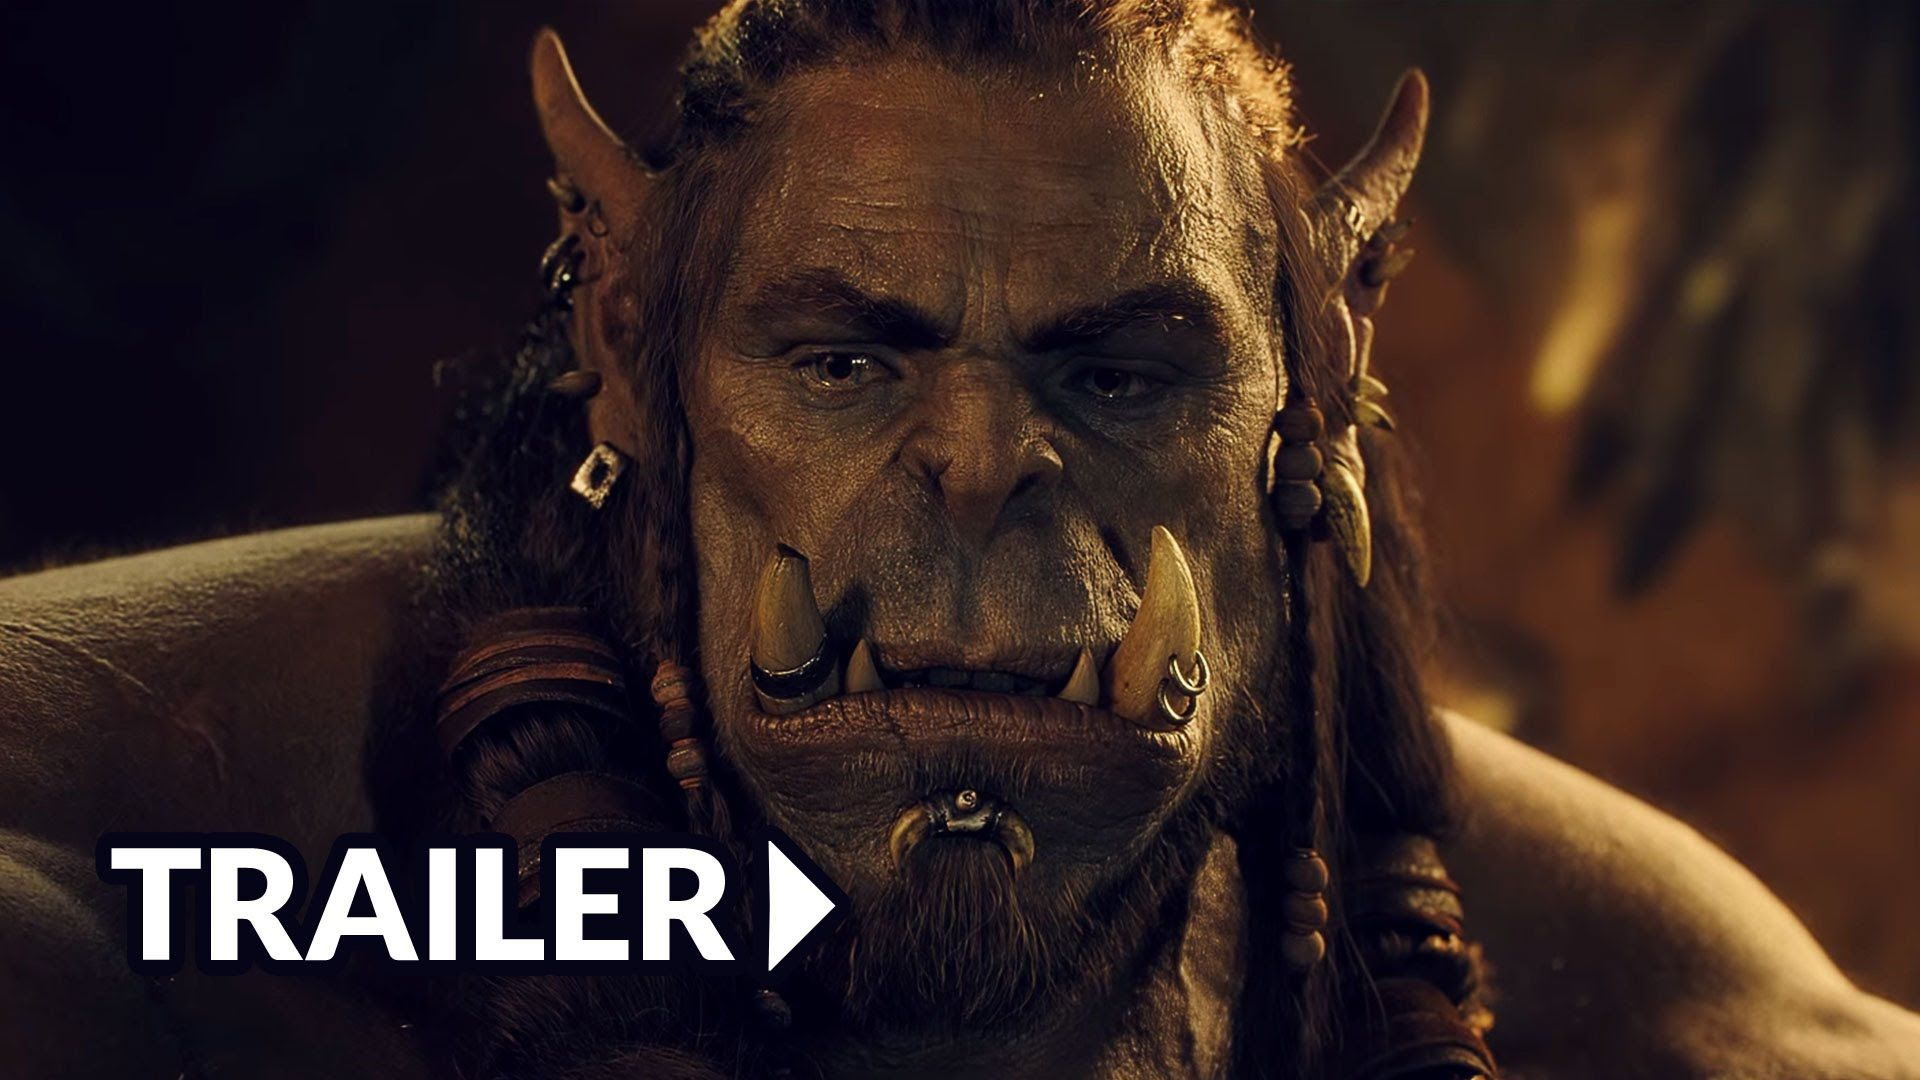 Check out Warcraft trailer http://goodmovies4u.com/tube/Warcraft-trailer #Warcraft #TravisFimmel #BenFoster #action #adventure #fantasy #goodmovies #trailer #movies4u #movie #film